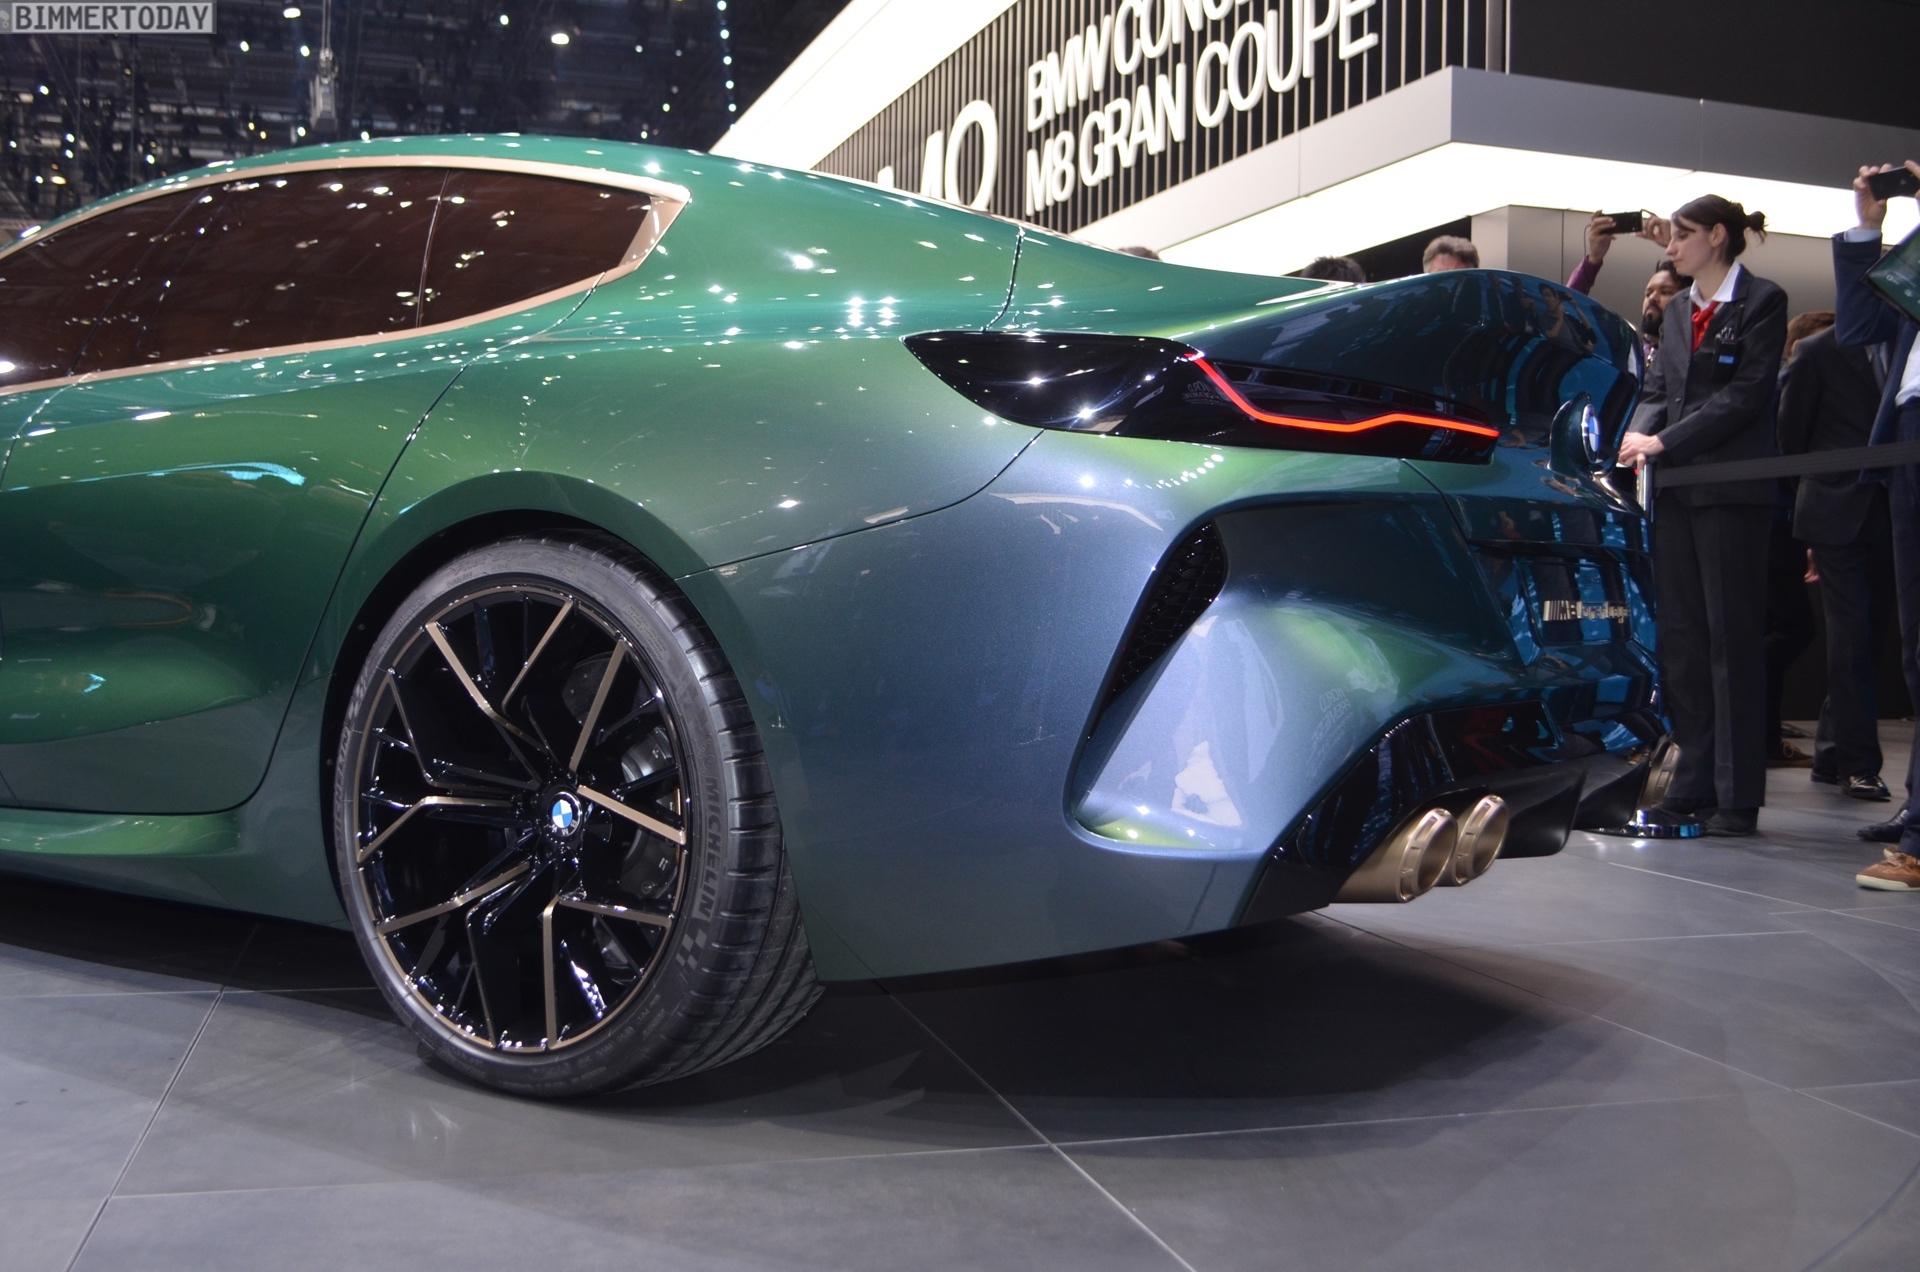 BMW Concept M8 Gran Coupe - Real Life Photos